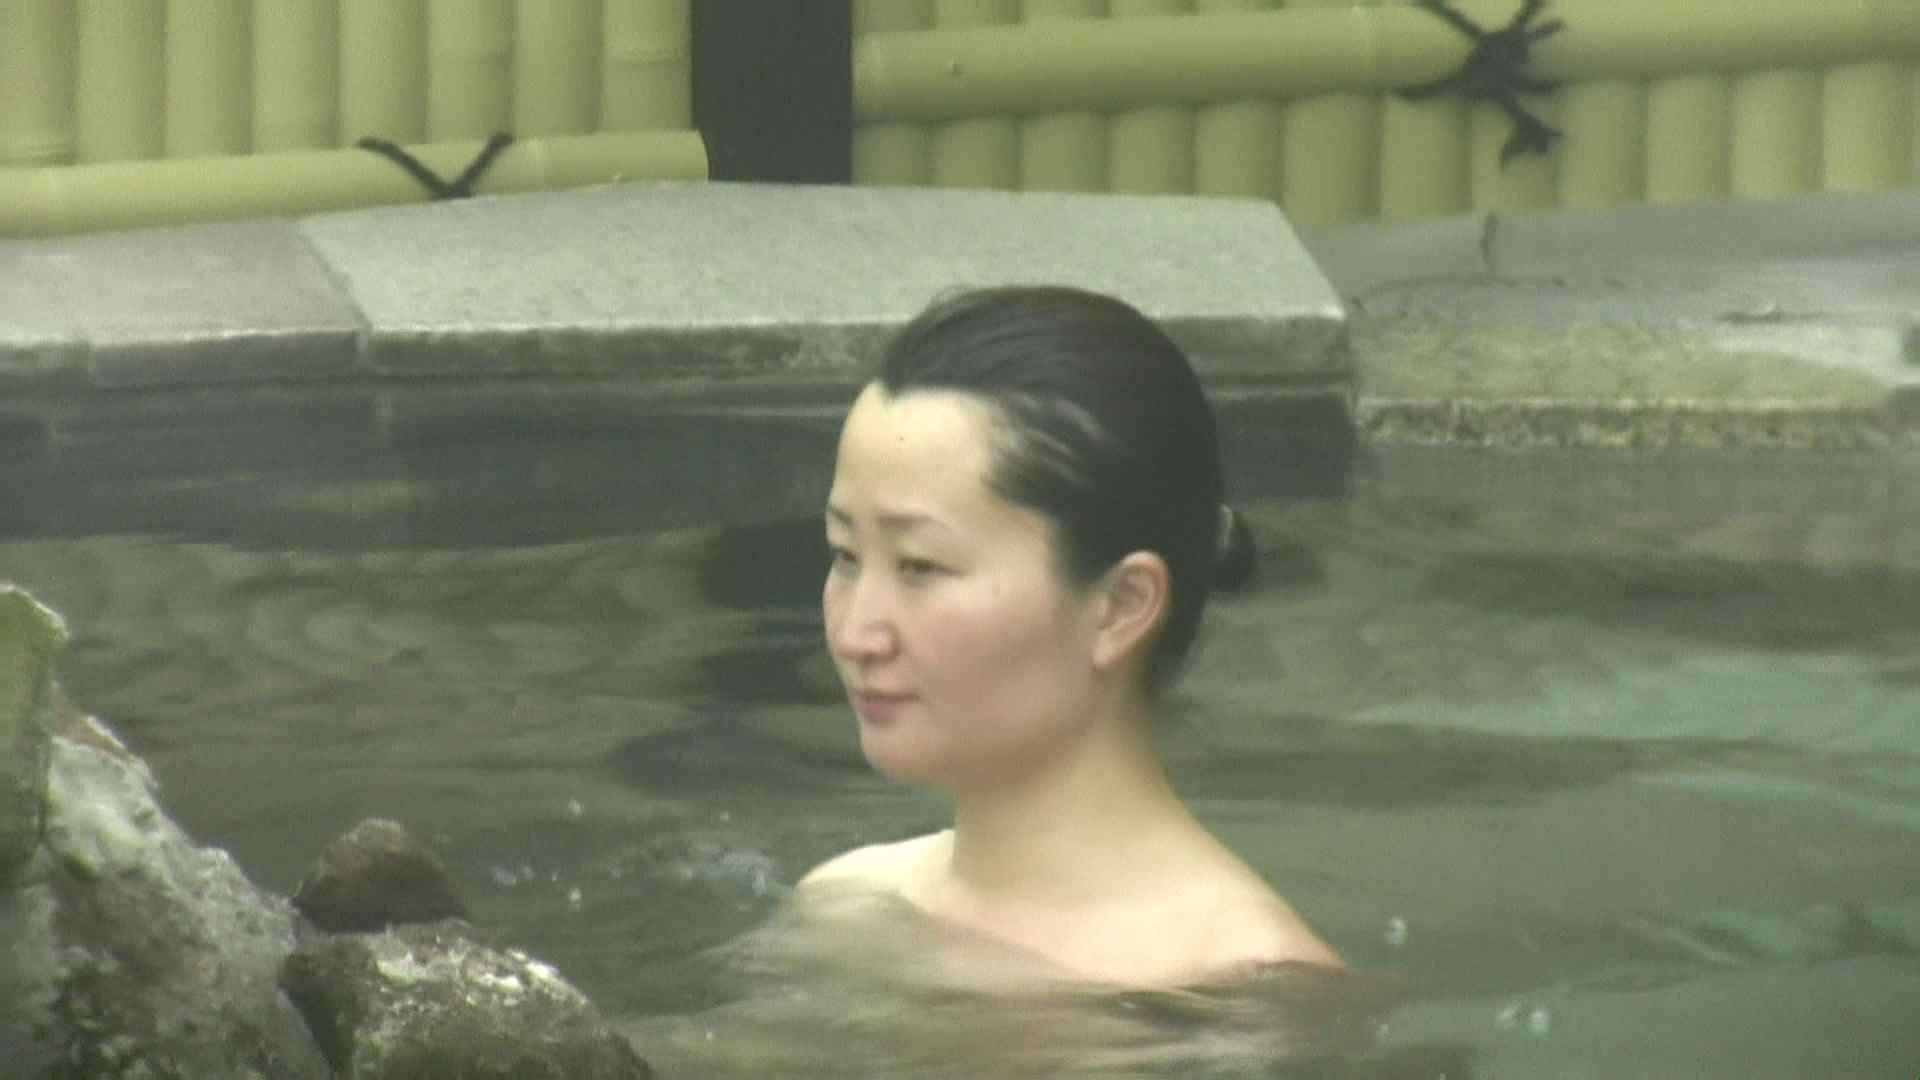 Aquaな露天風呂Vol.632 盗撮 | OLエロ画像  41PICs 16